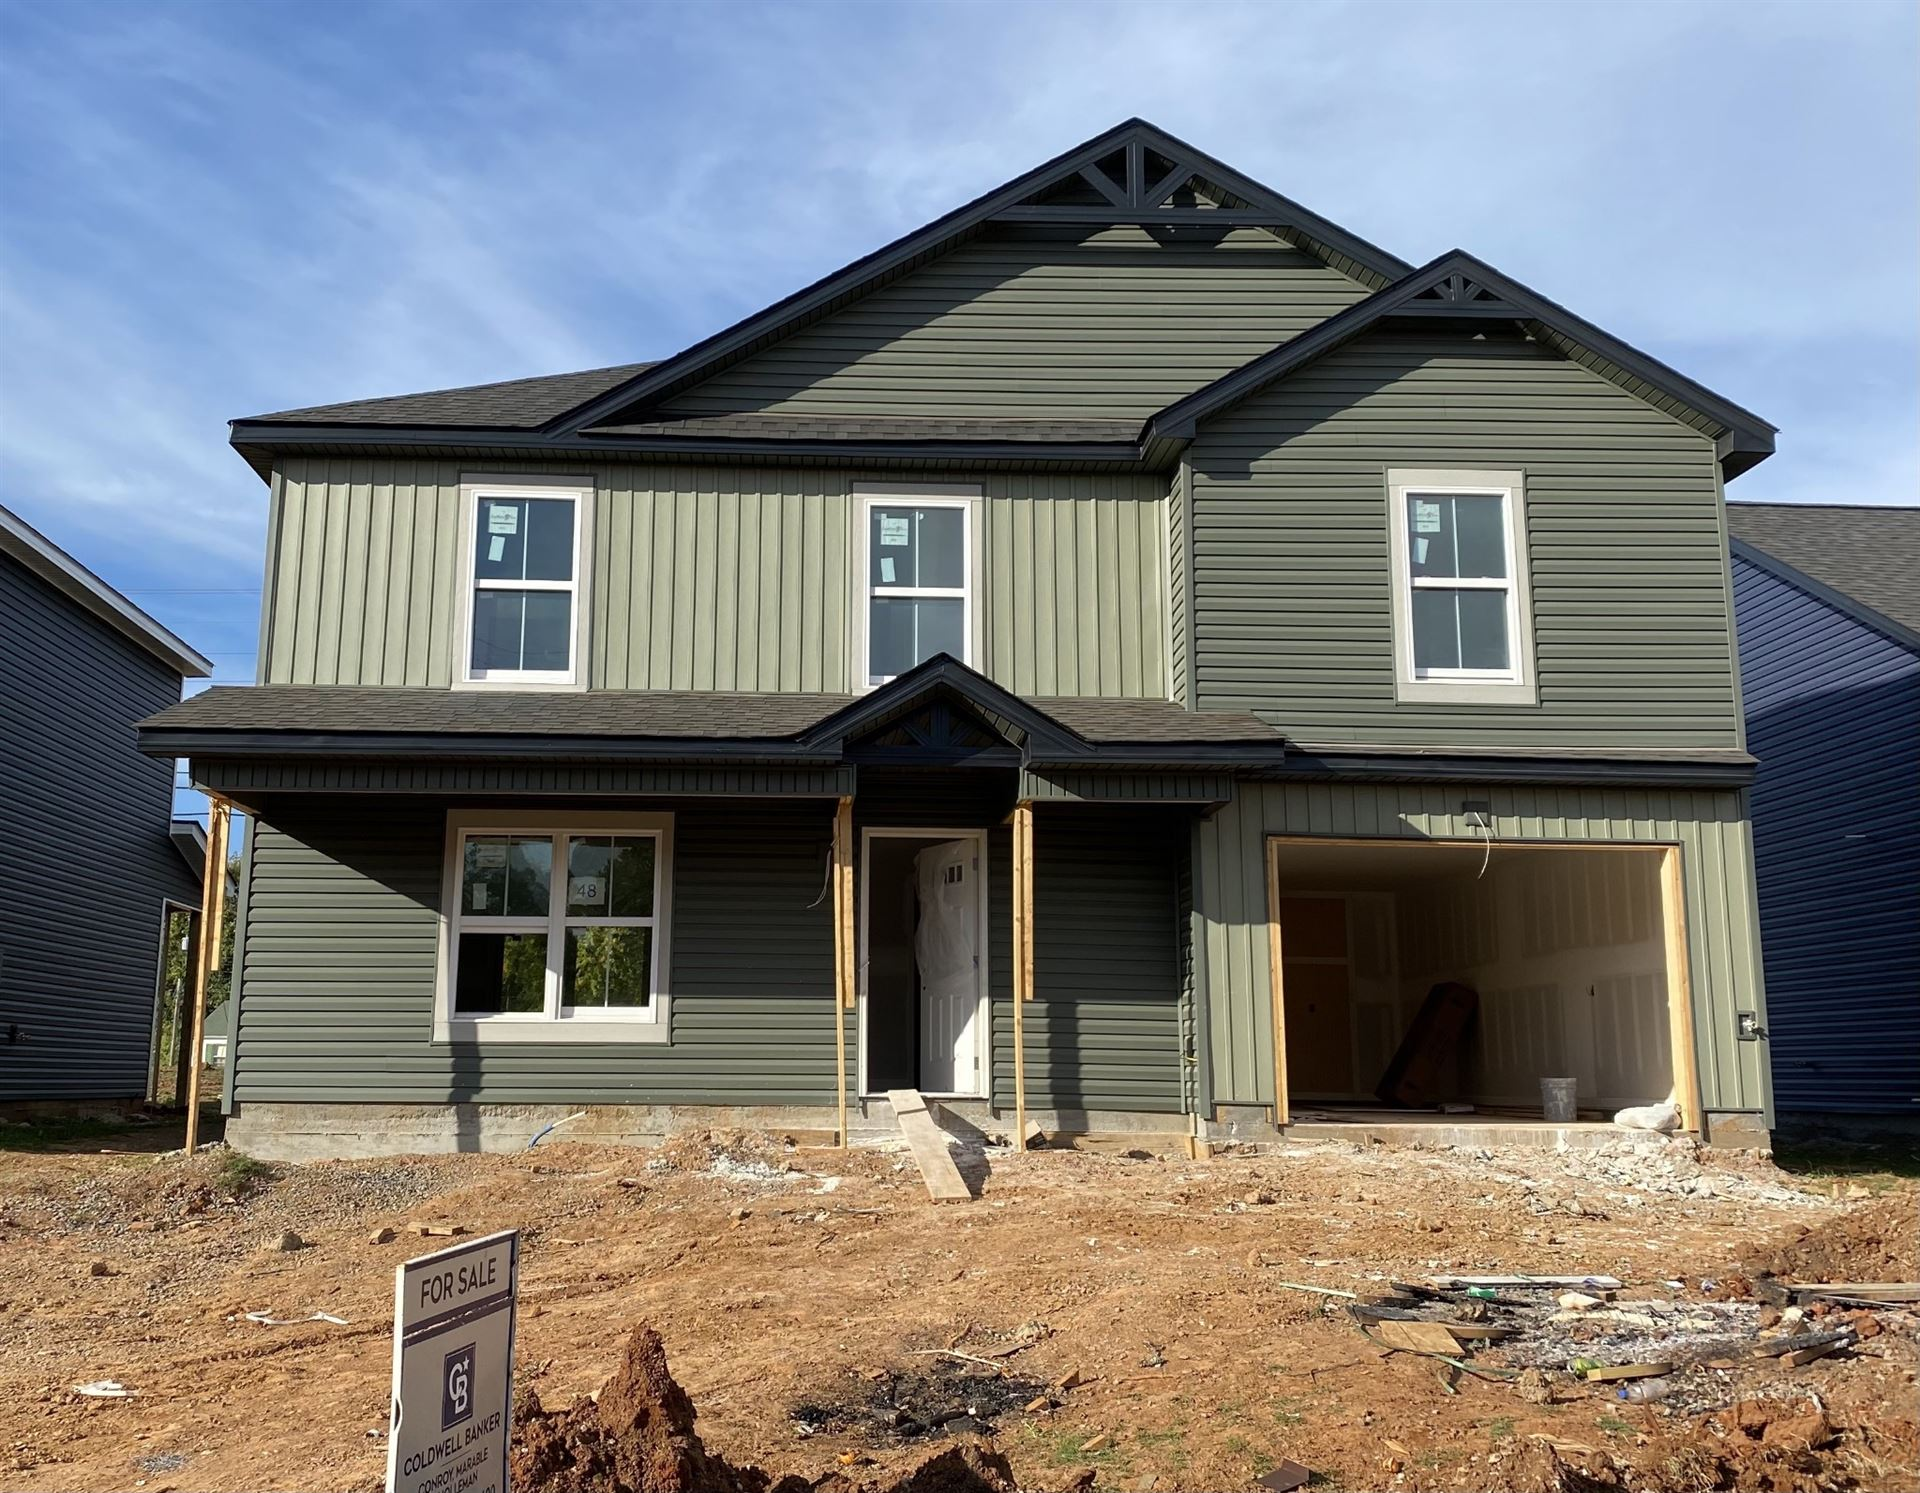 48 Campbell Heights, Clarksville, TN 37042 - MLS#: 2292058